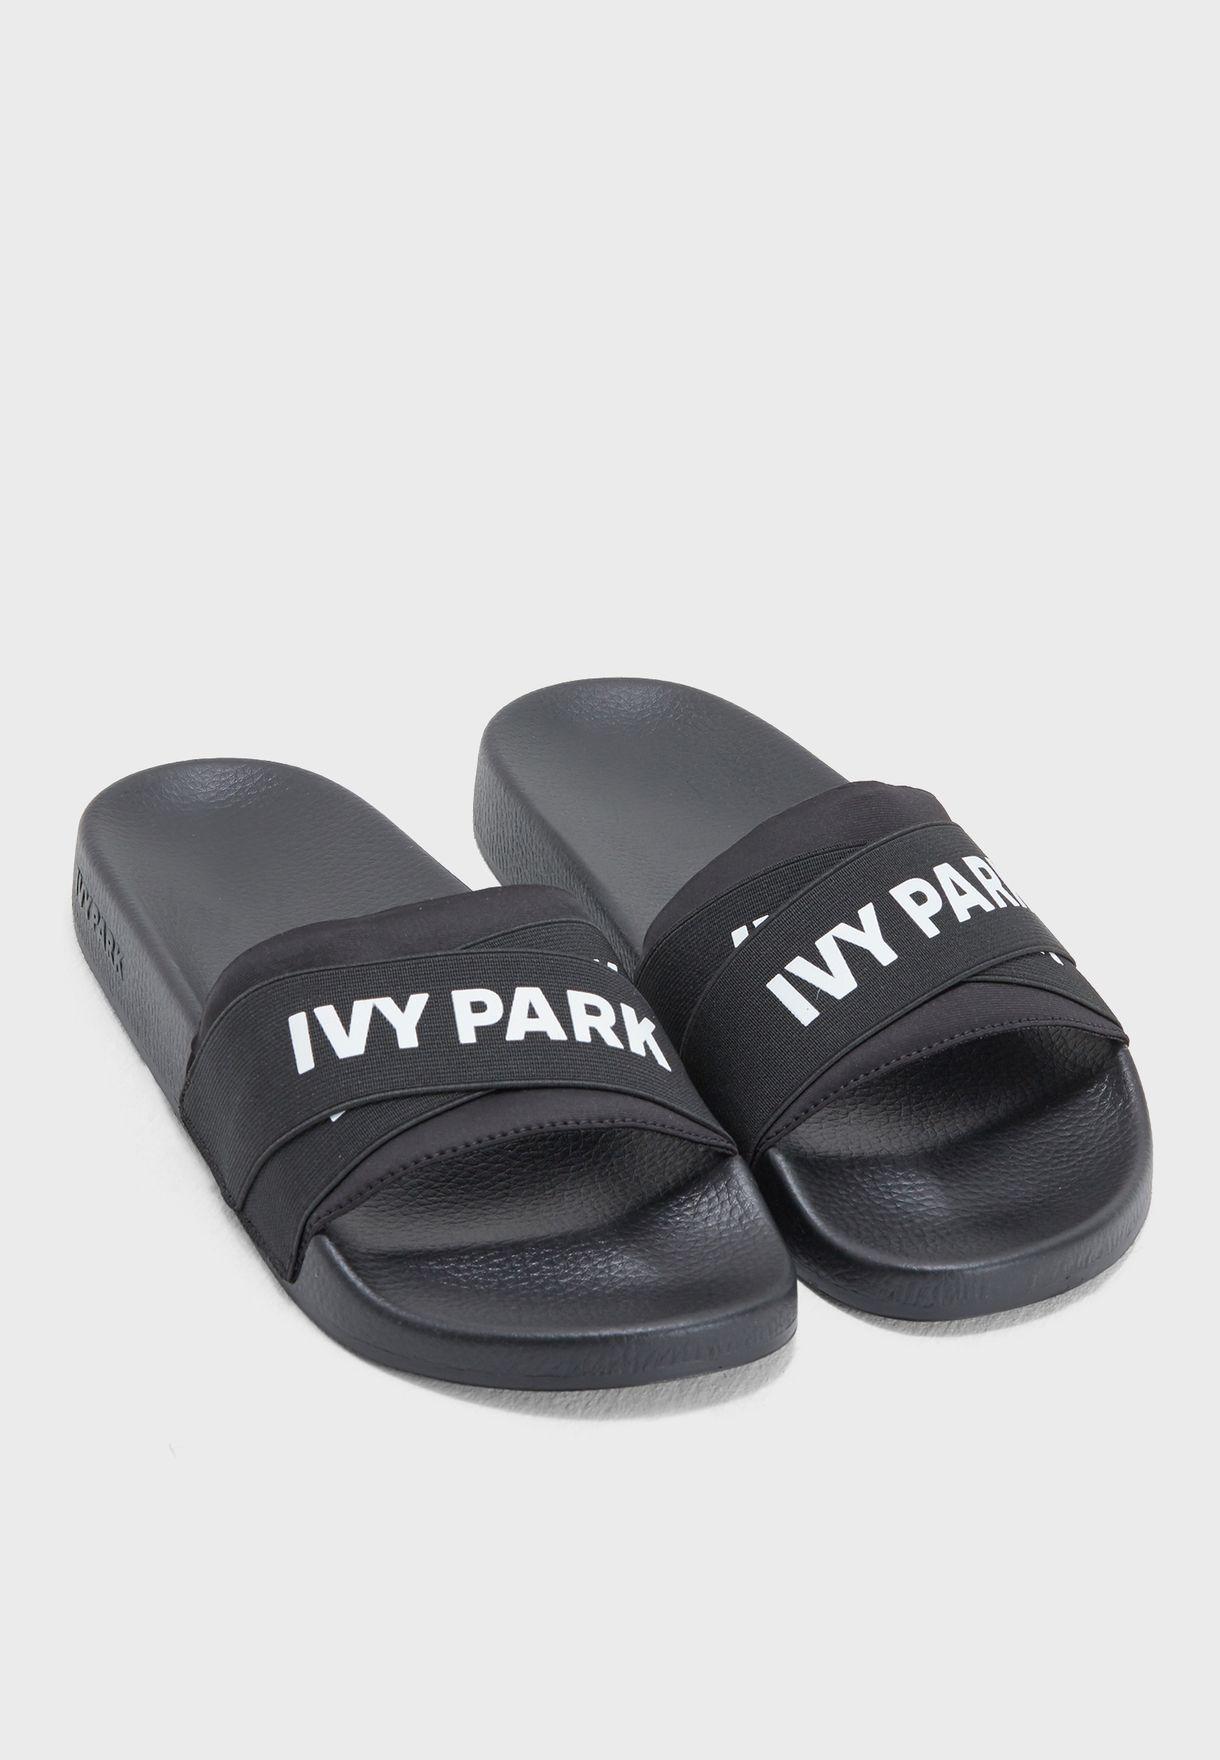 dcd1aee70e5538 Shop Ivy Park black Logo Strap Slider 29E18QBLK for Women in Qatar -  IV938SH02RFD